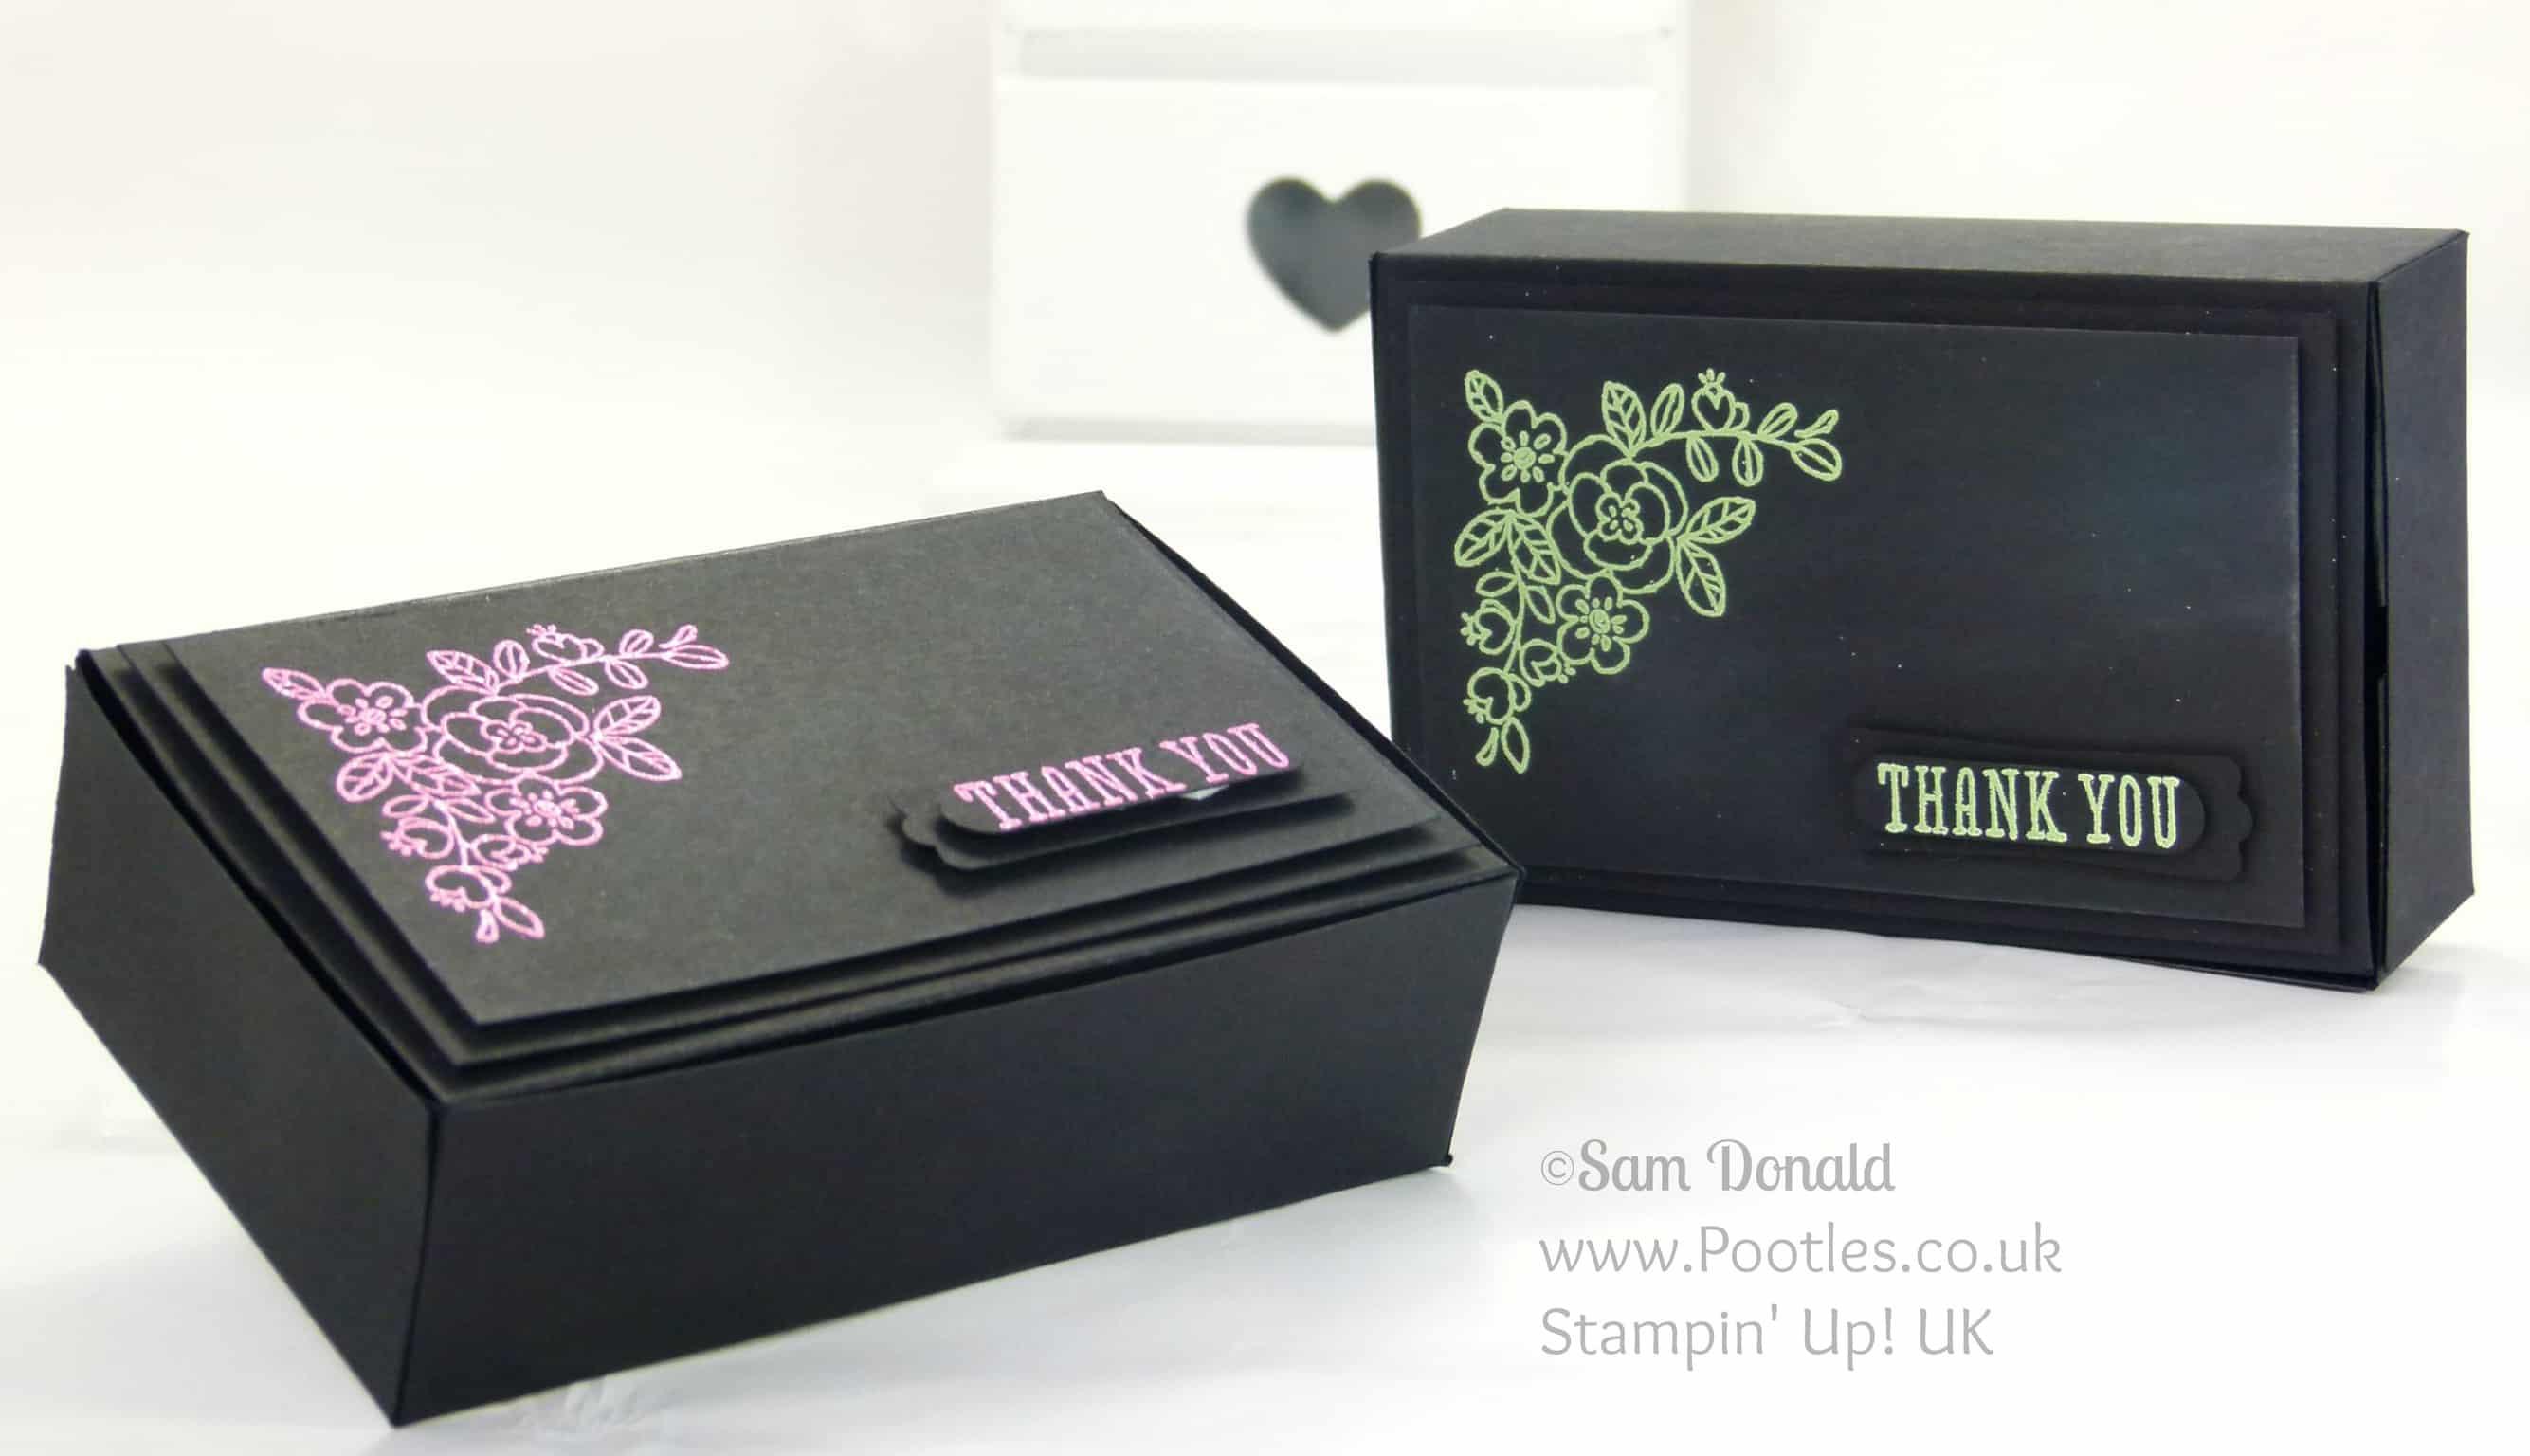 POOTLES Stampin' Up! UK Independent Demonstrator - Heat Embossed Stylish Box Tutorial using Stampin' Up! supplies